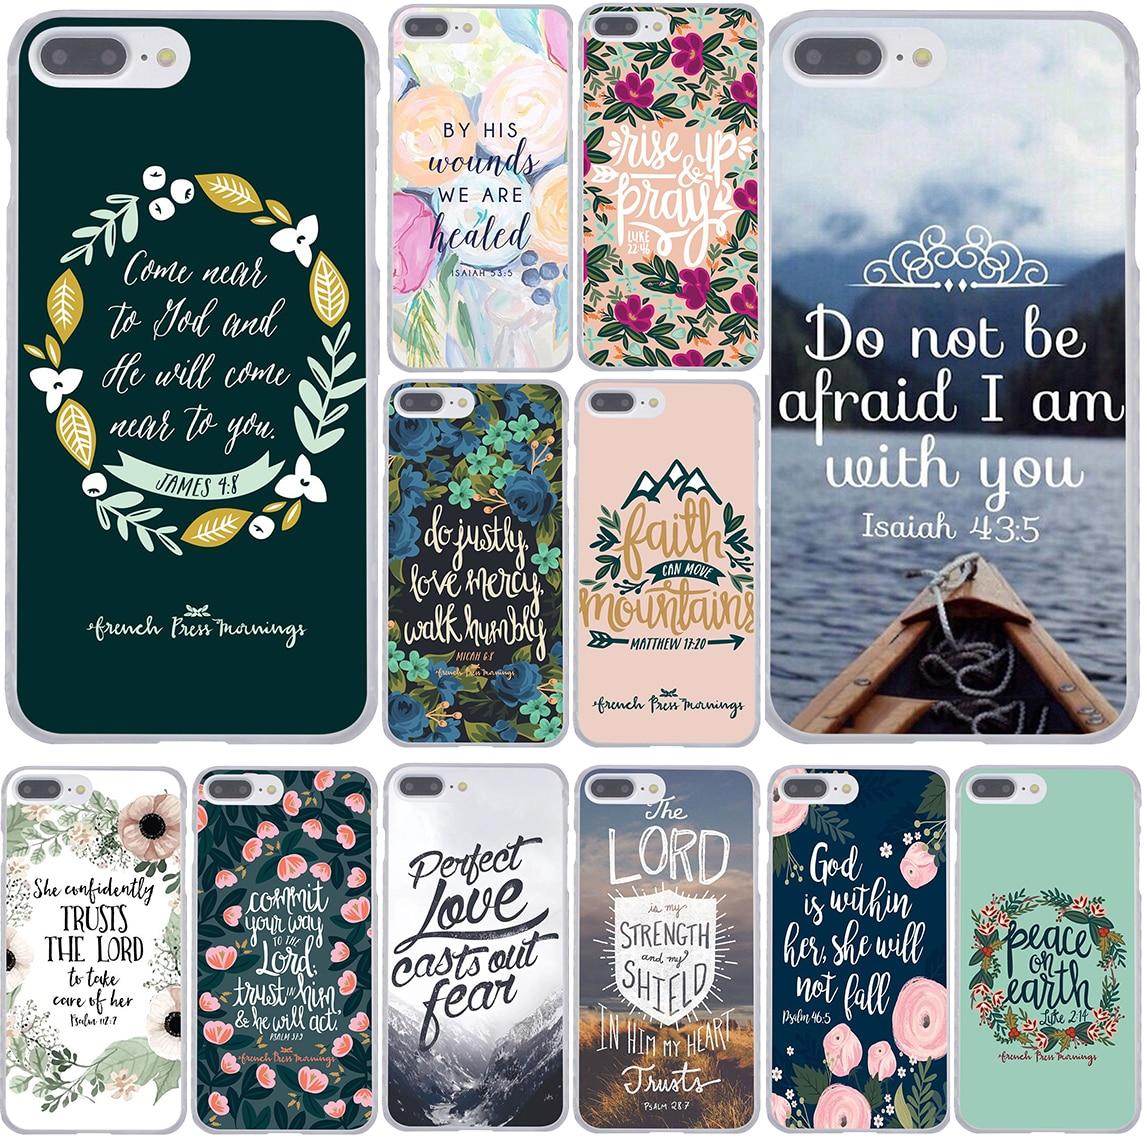 Bible verse Philippians Jesus Christ Christian Phone Cover Case for Apple iPhone 7 7 Plus 6 6s Plus 5 5S SE 5C 4 4S Coque Shell